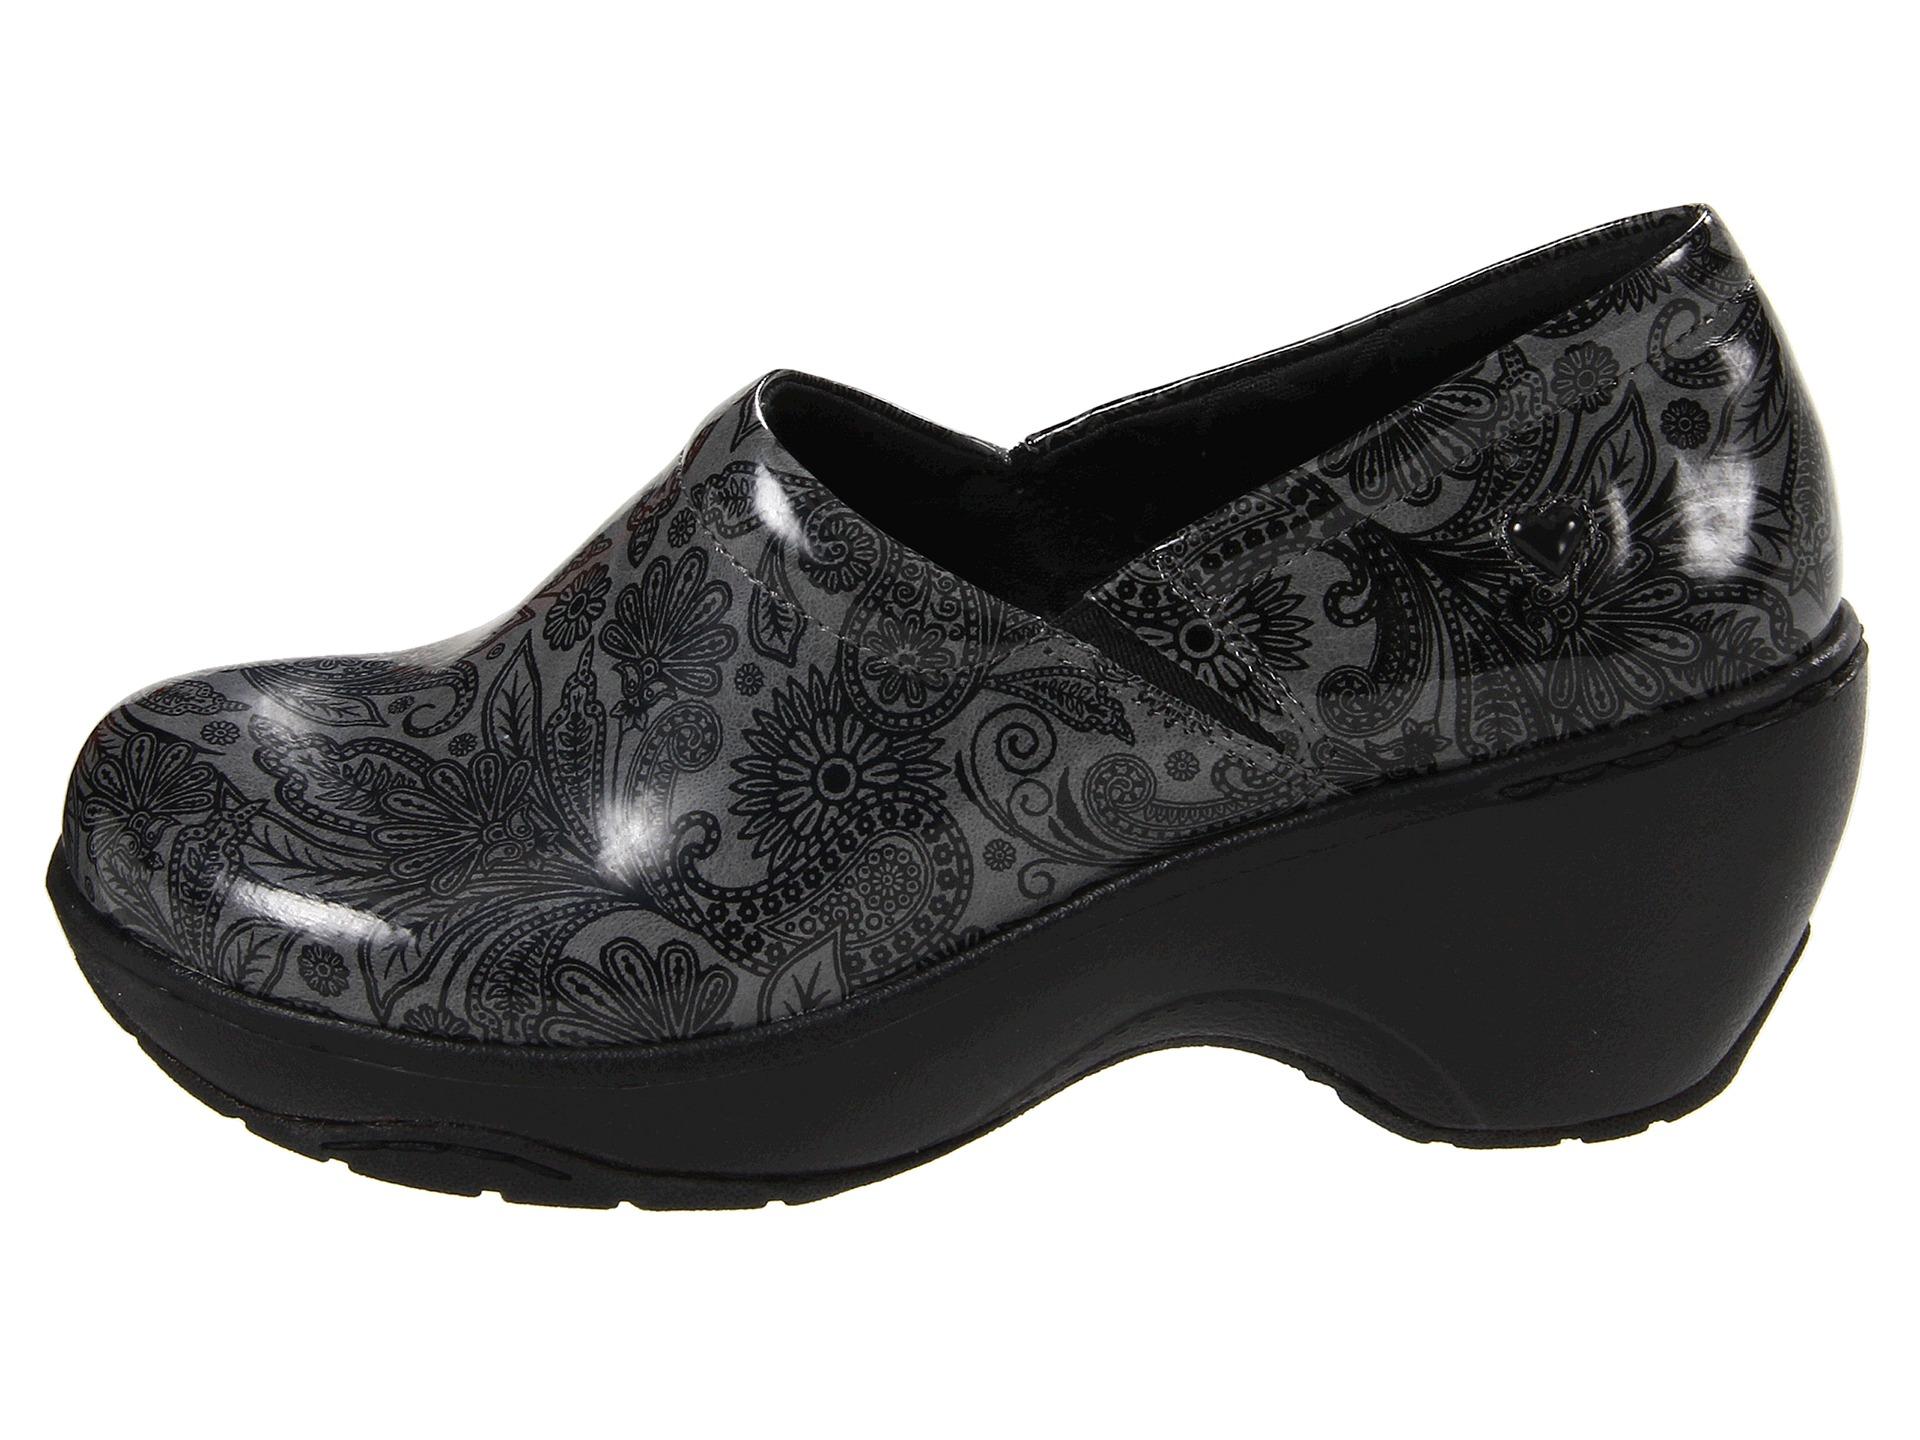 Nurse Mates Bryar Shoes Reviews